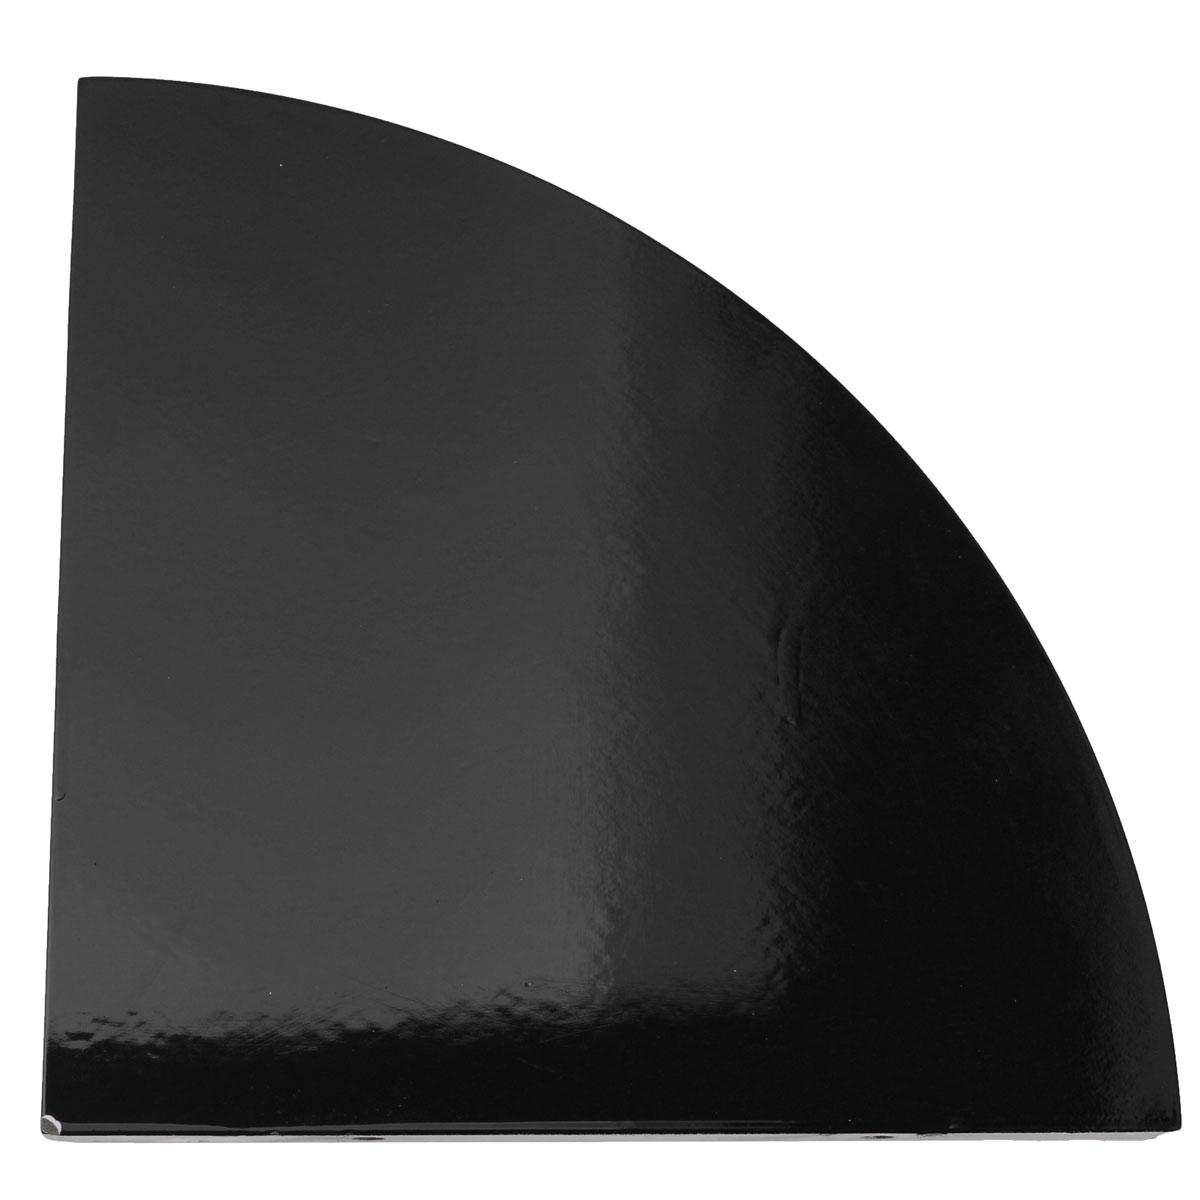 28x28cm Corner Shelf Floating Wall Corner Shelf Unit Display Gloss Wood Storage